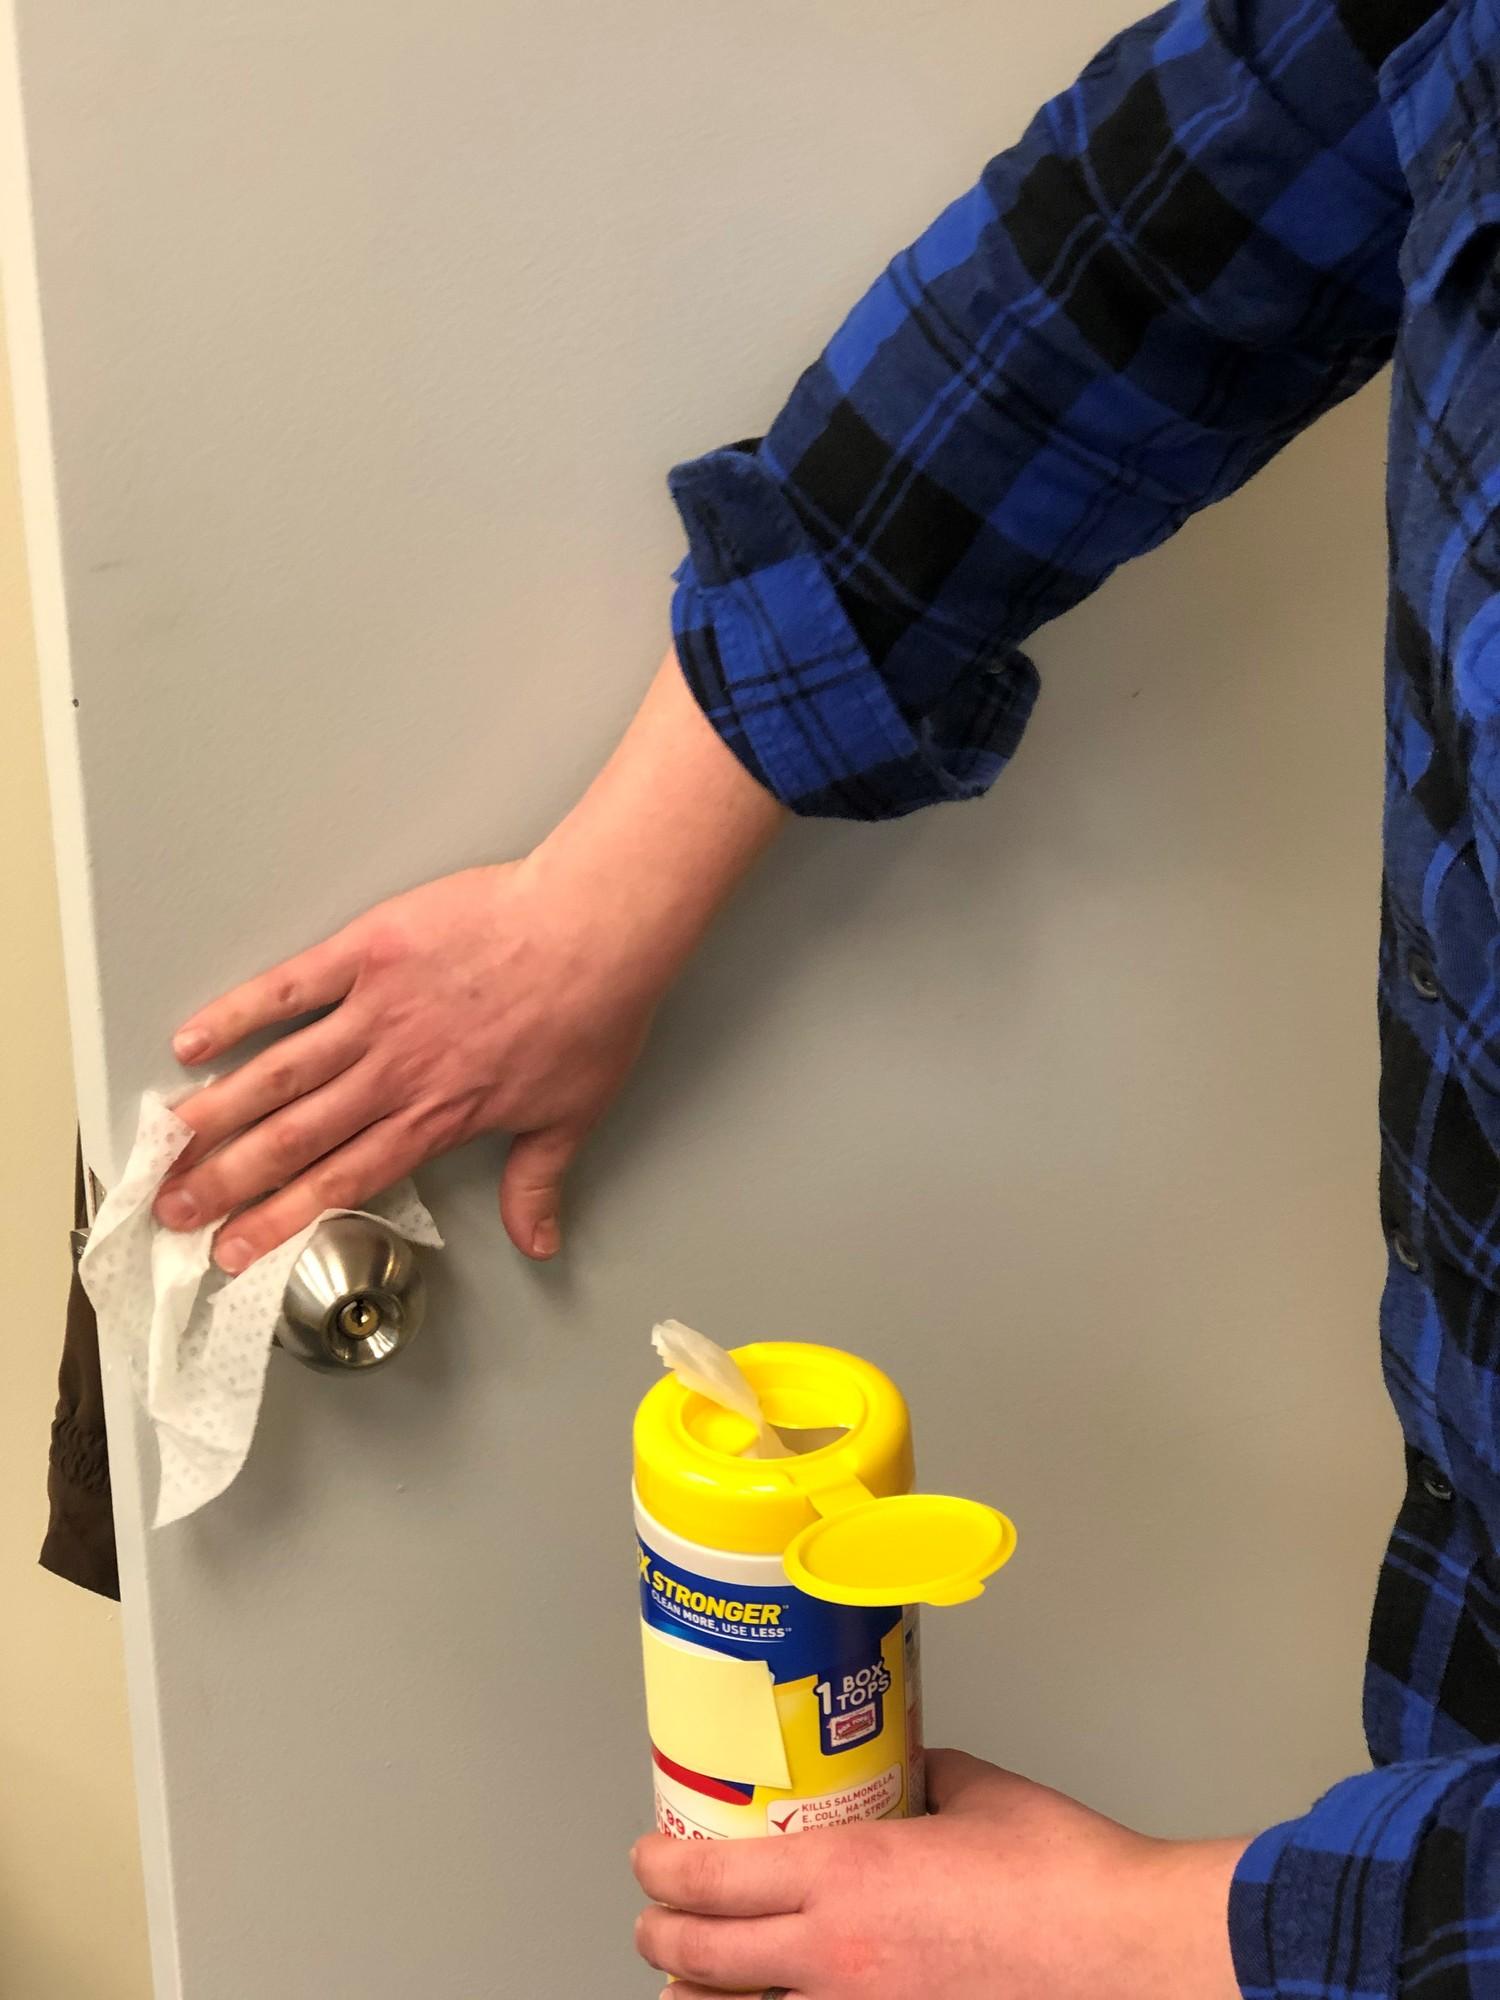 disinfection of a doorknob